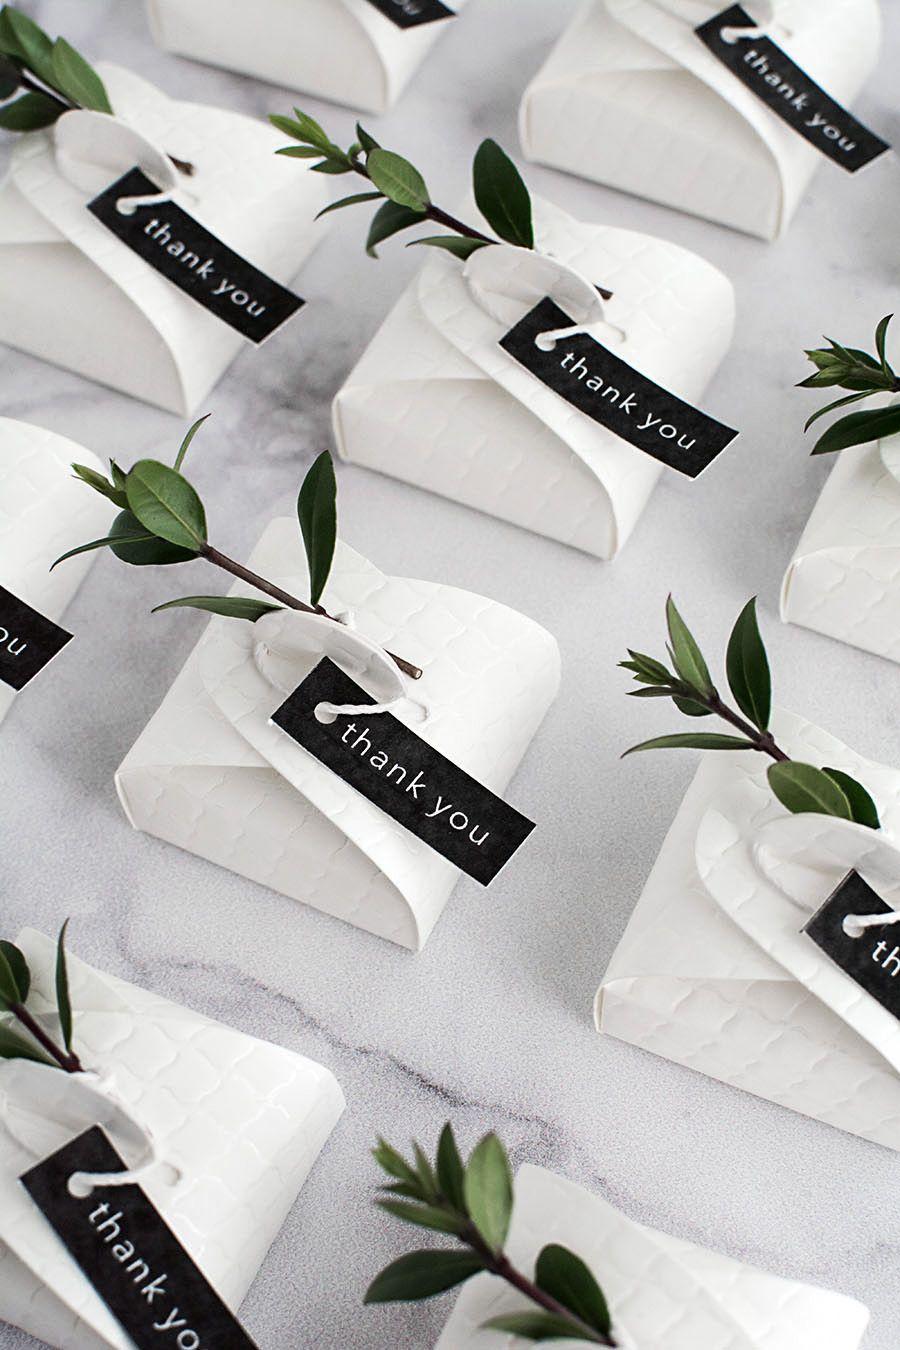 3 Simple and Modern DIY Wedding Favors | Packaging ideas, Modern diy ...